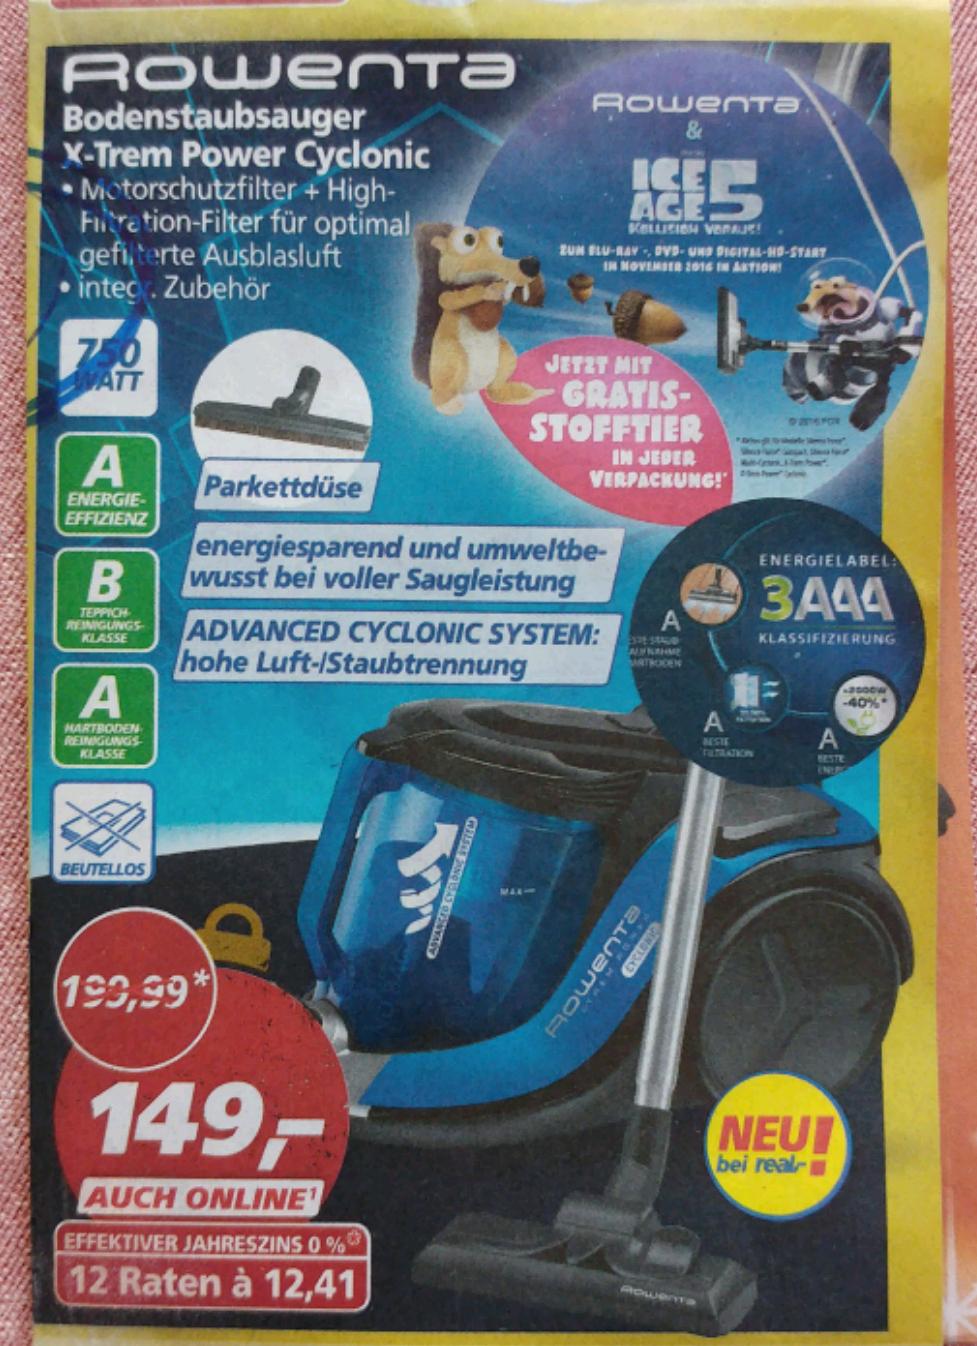 Bodenstaubsauger Rowenta RO 6941 EA